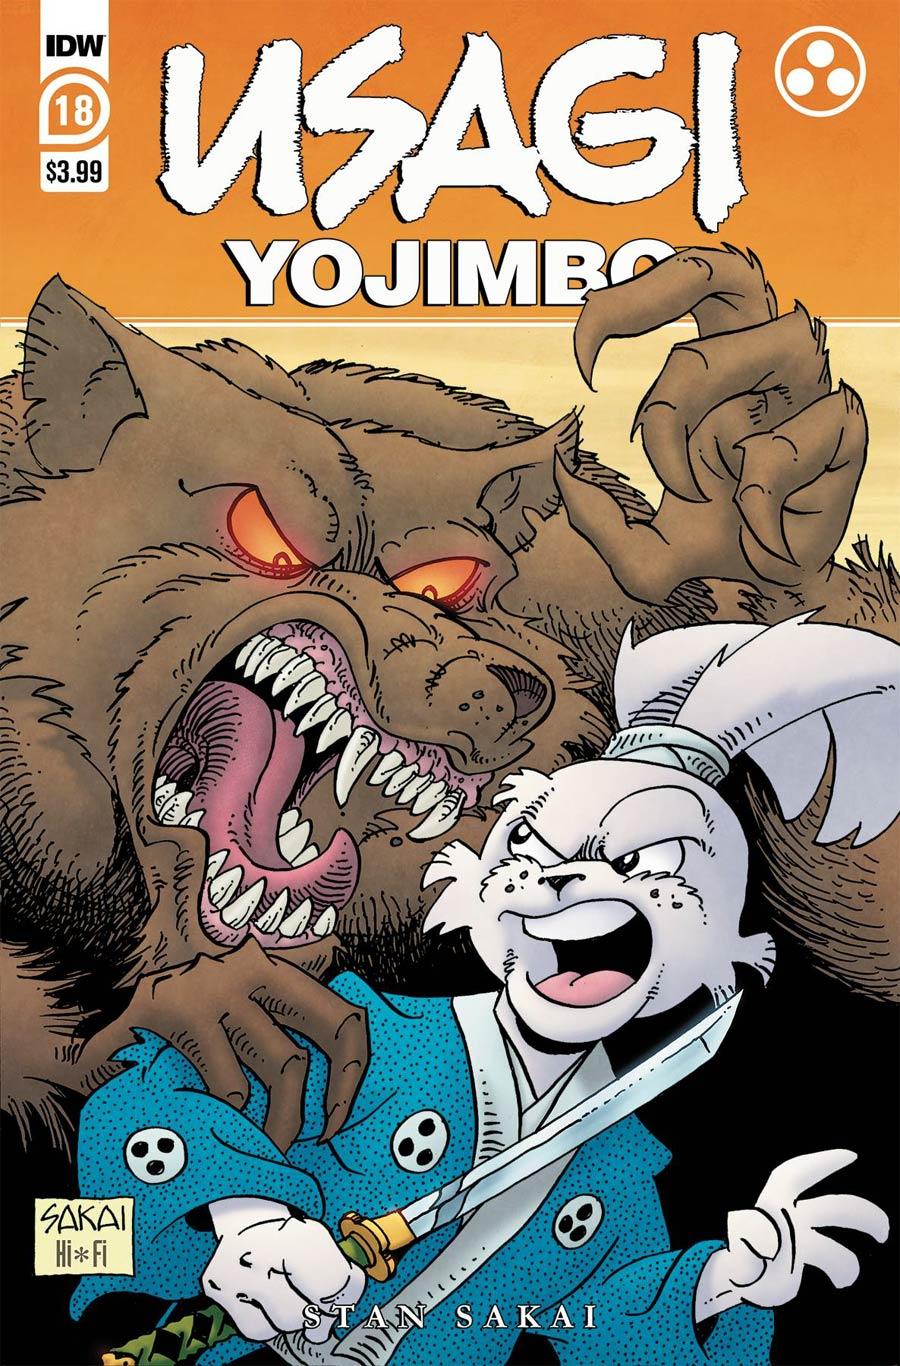 Usagi Yojimbo Vol 4 #18 Cover A Regular Stan Sakai Cover